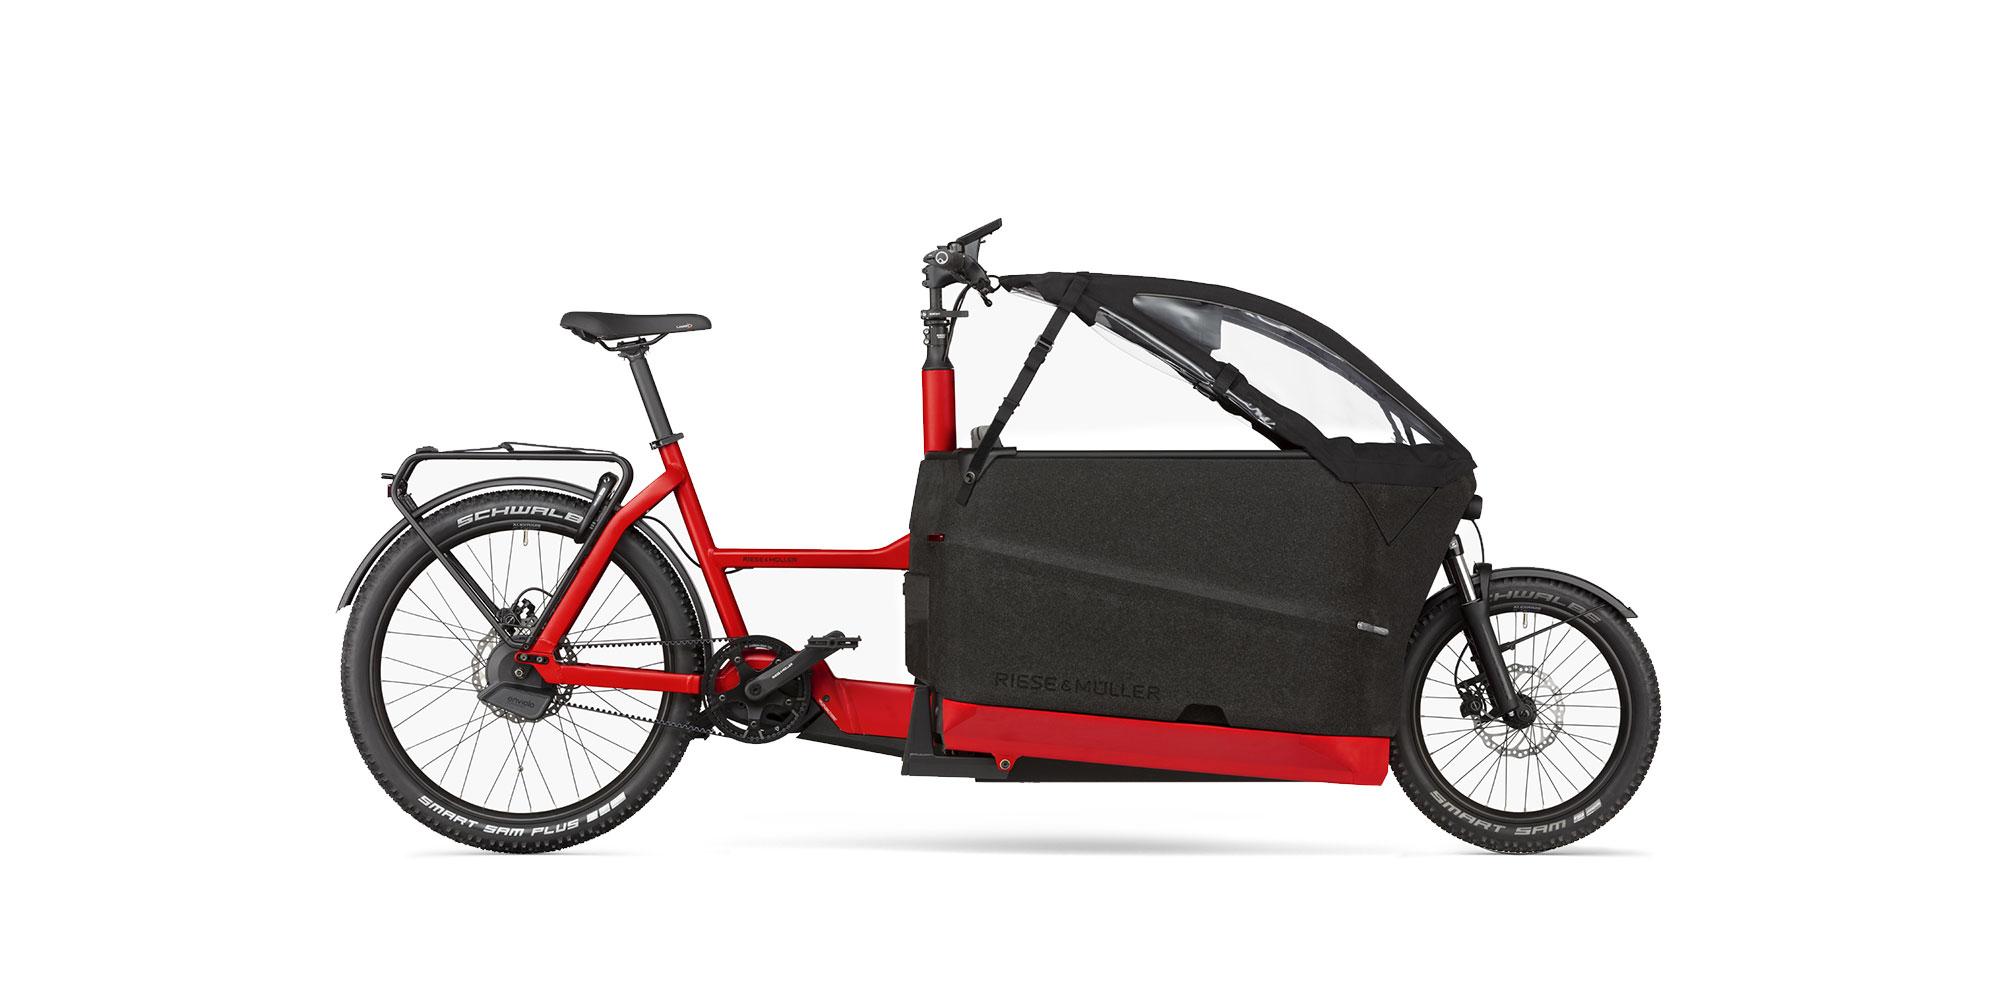 Riese Müller 2021 F00522 Packster 70 Enviolo Automatic Chilli Matt GX Nyon Kindersitz Kinderverdeck offen